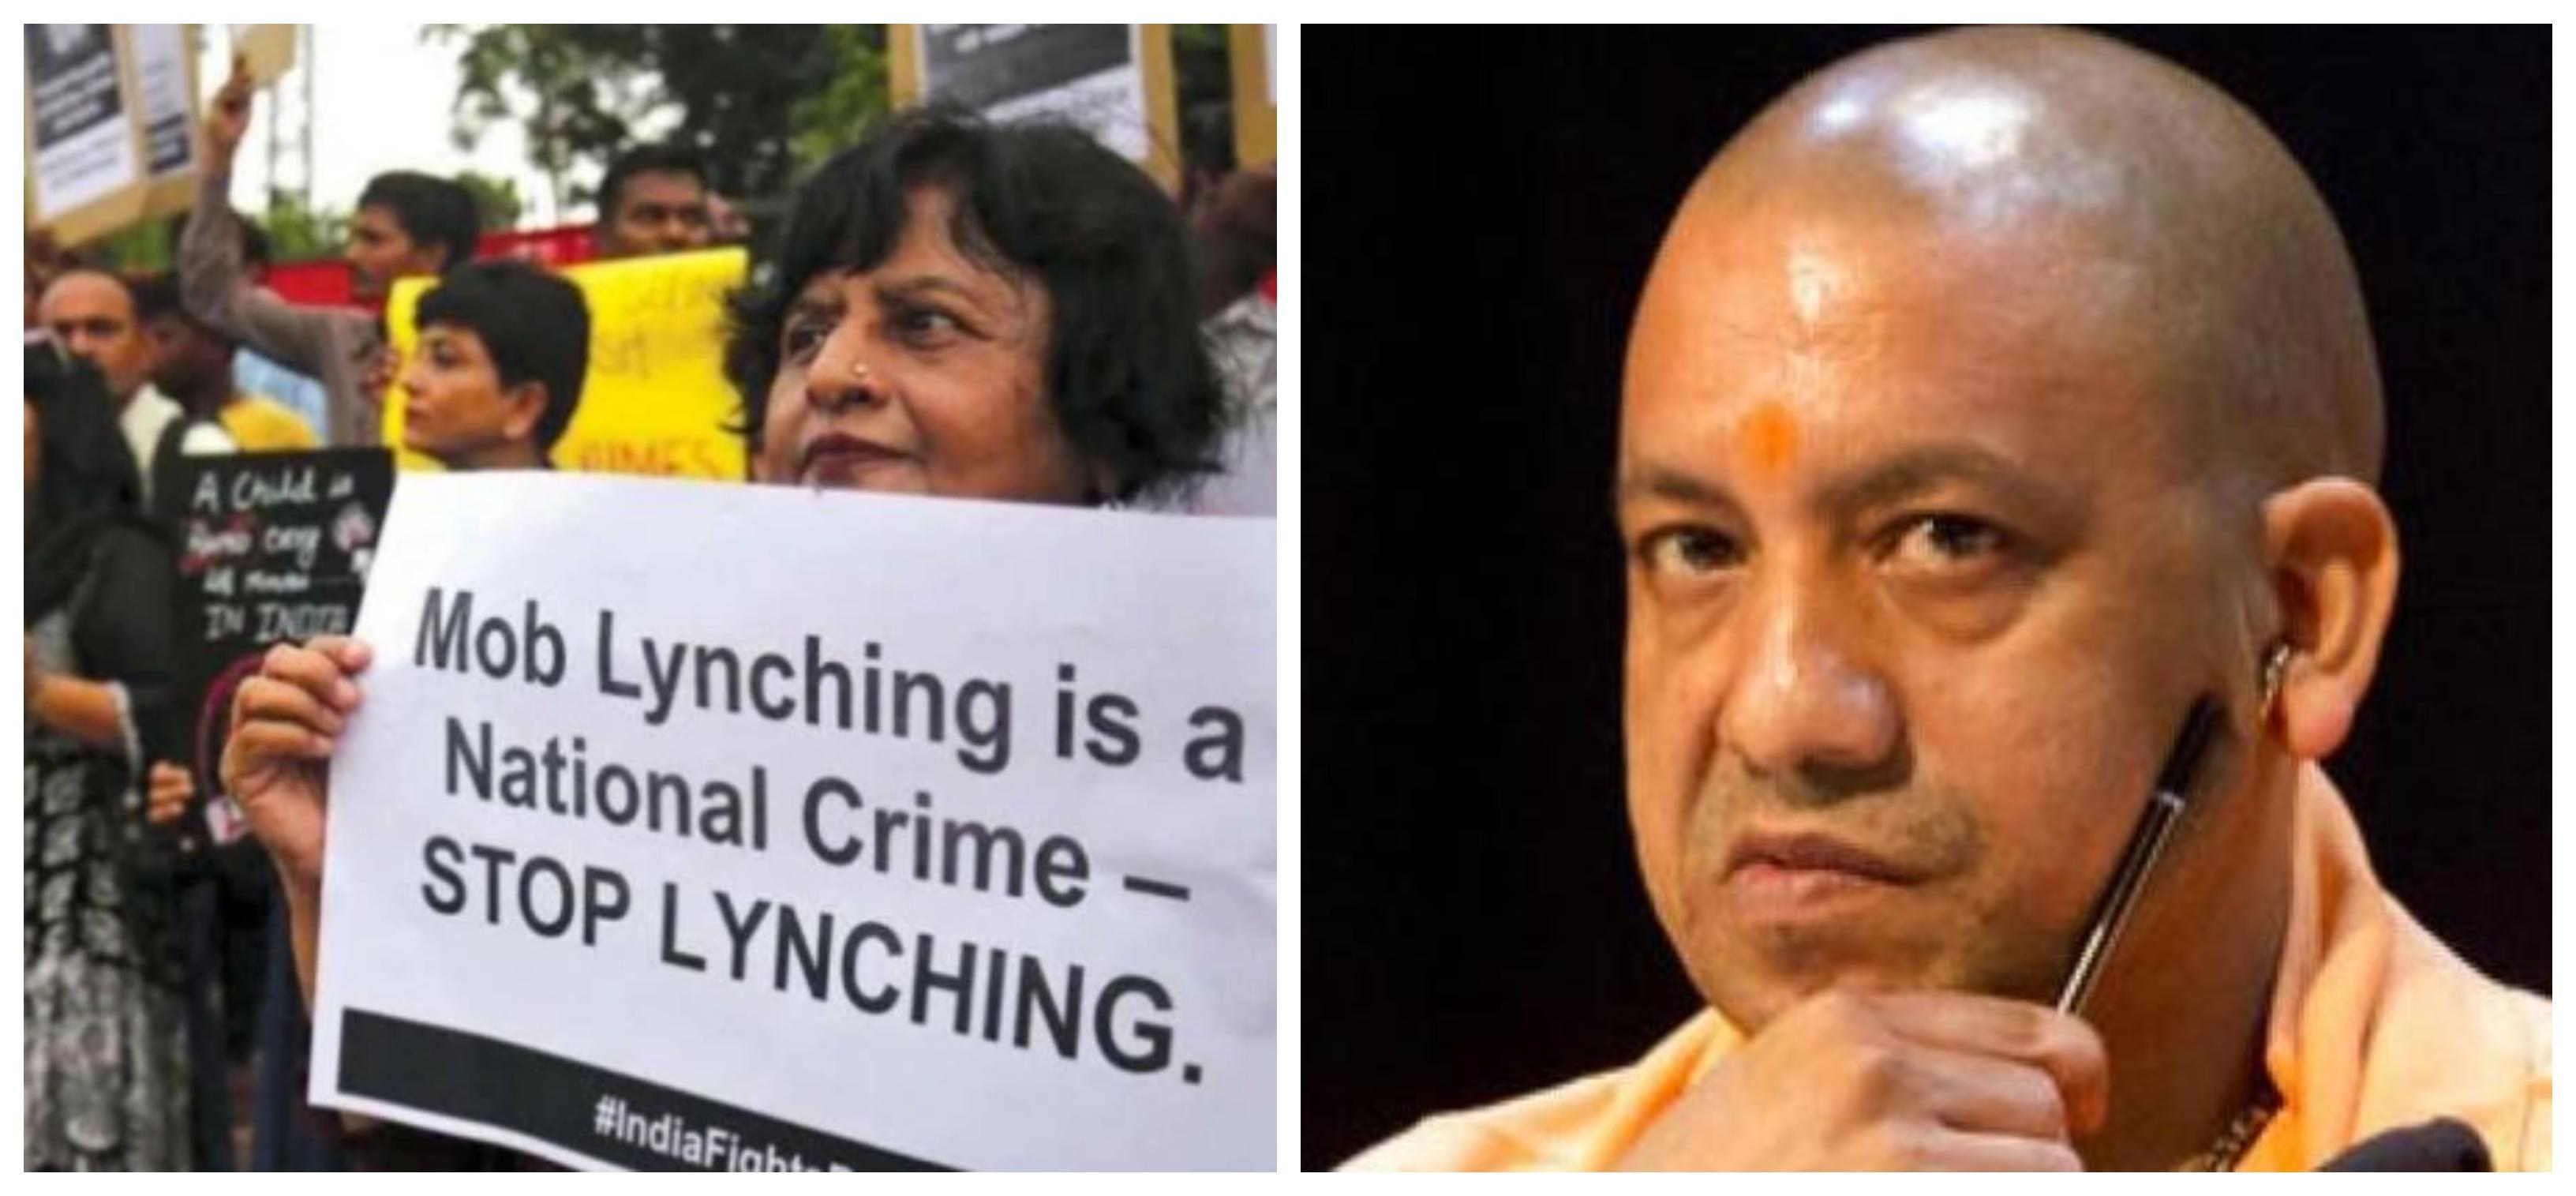 Mob Lynching draft bill in UP